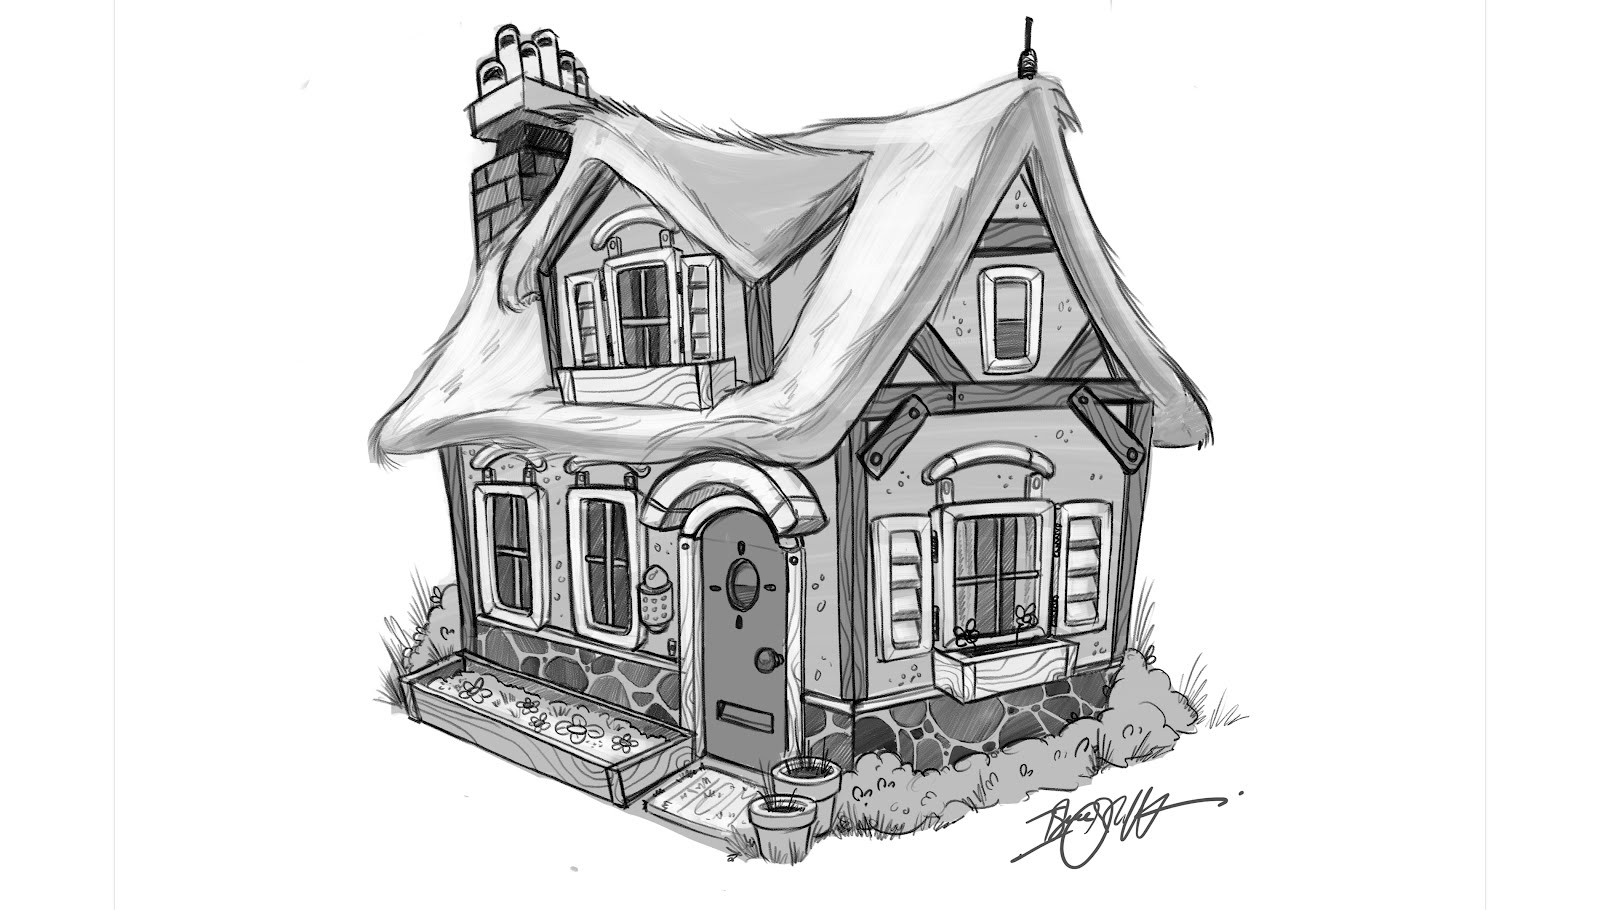 Isaac Orloff Illustration: Cottage Sketch